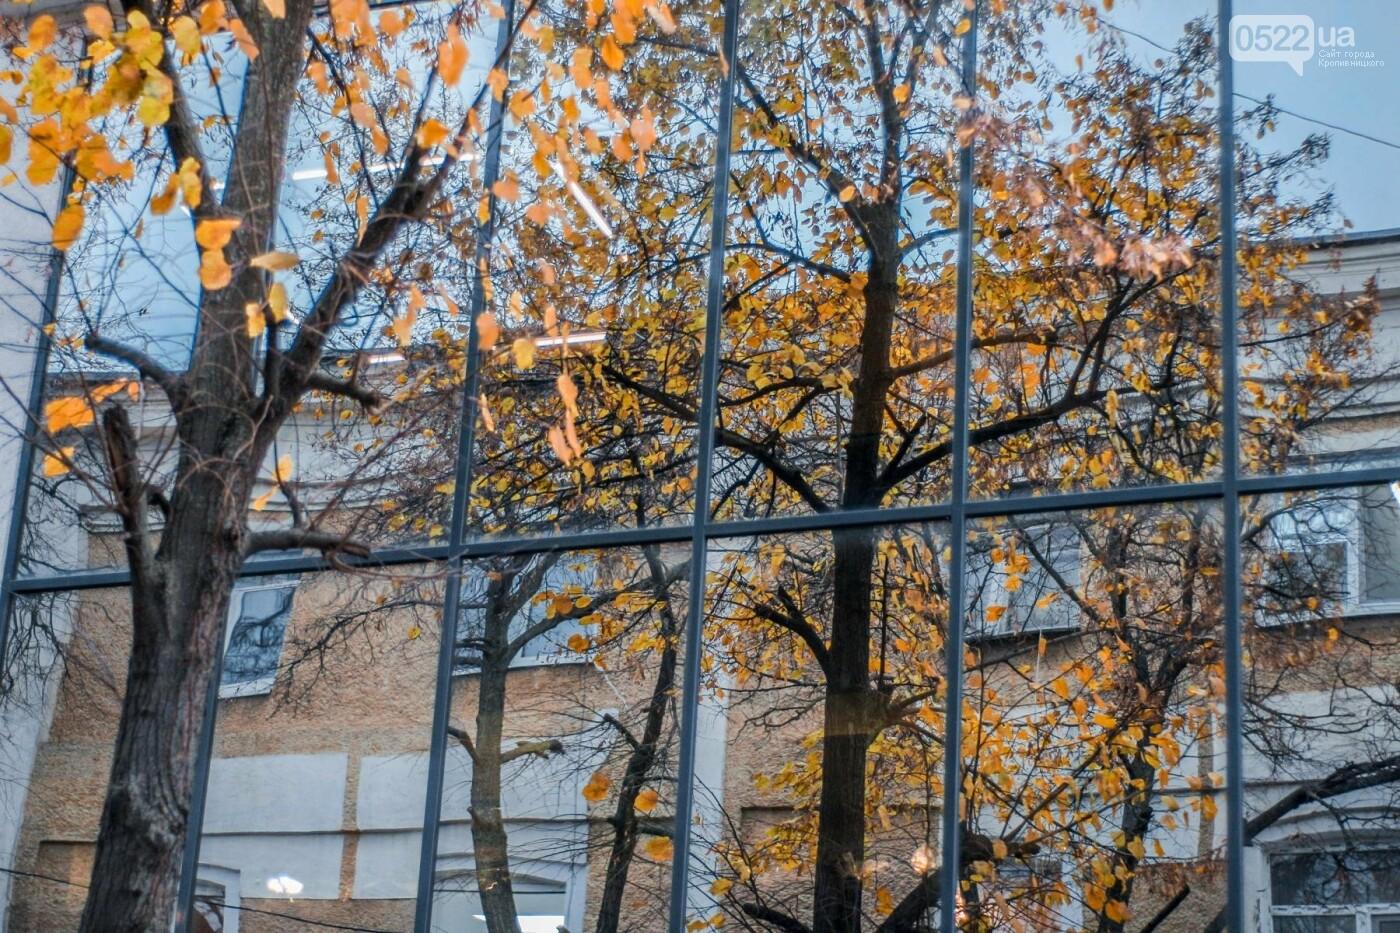 Листопад у Кропивницькому (Фото), фото-15